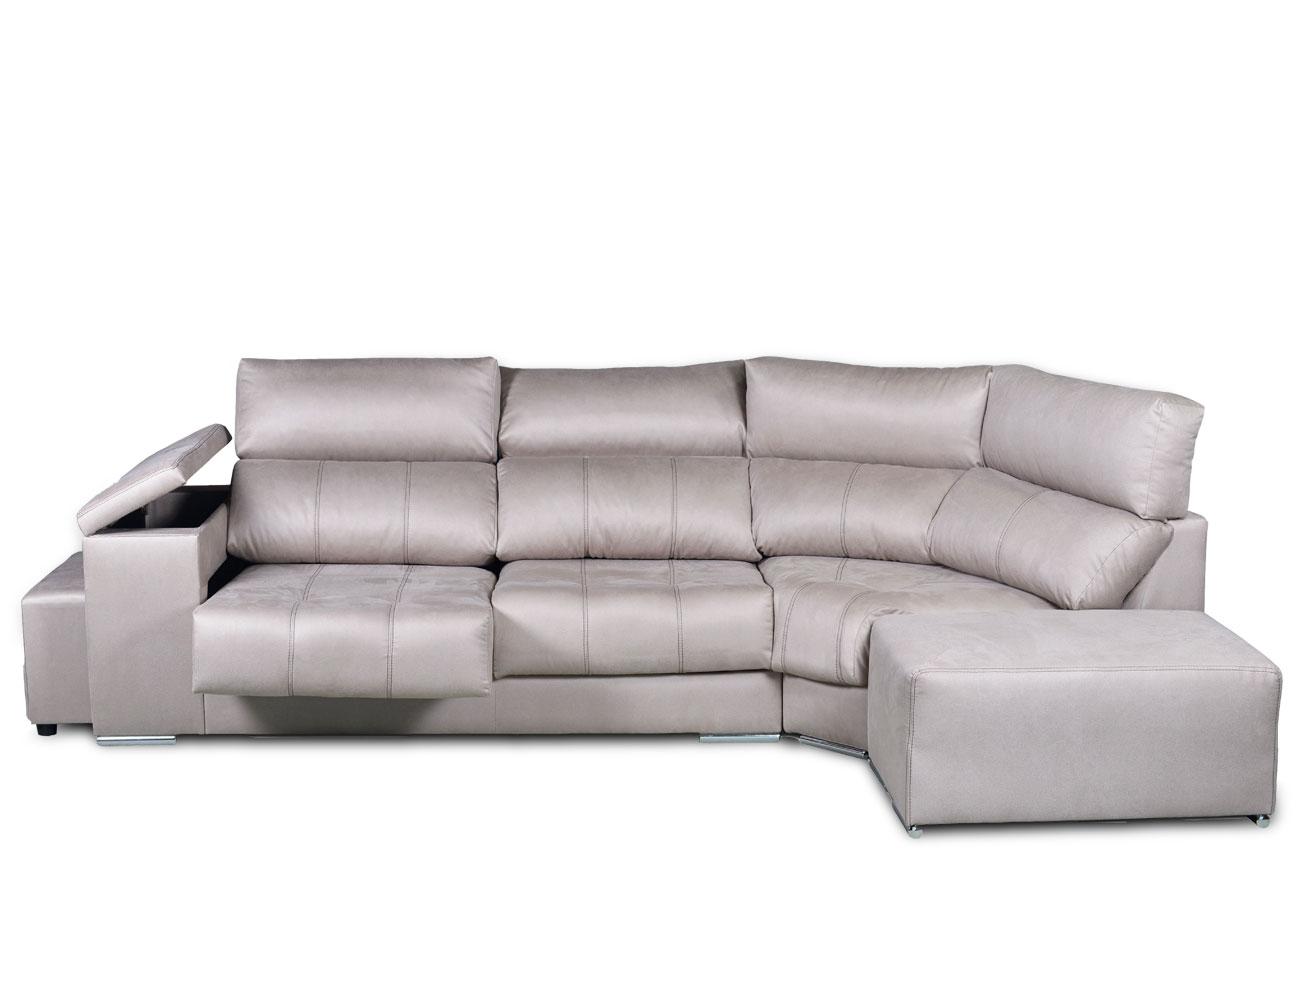 Sofa rinconera tejido anti manchas gris plata arcon taburetes puffs